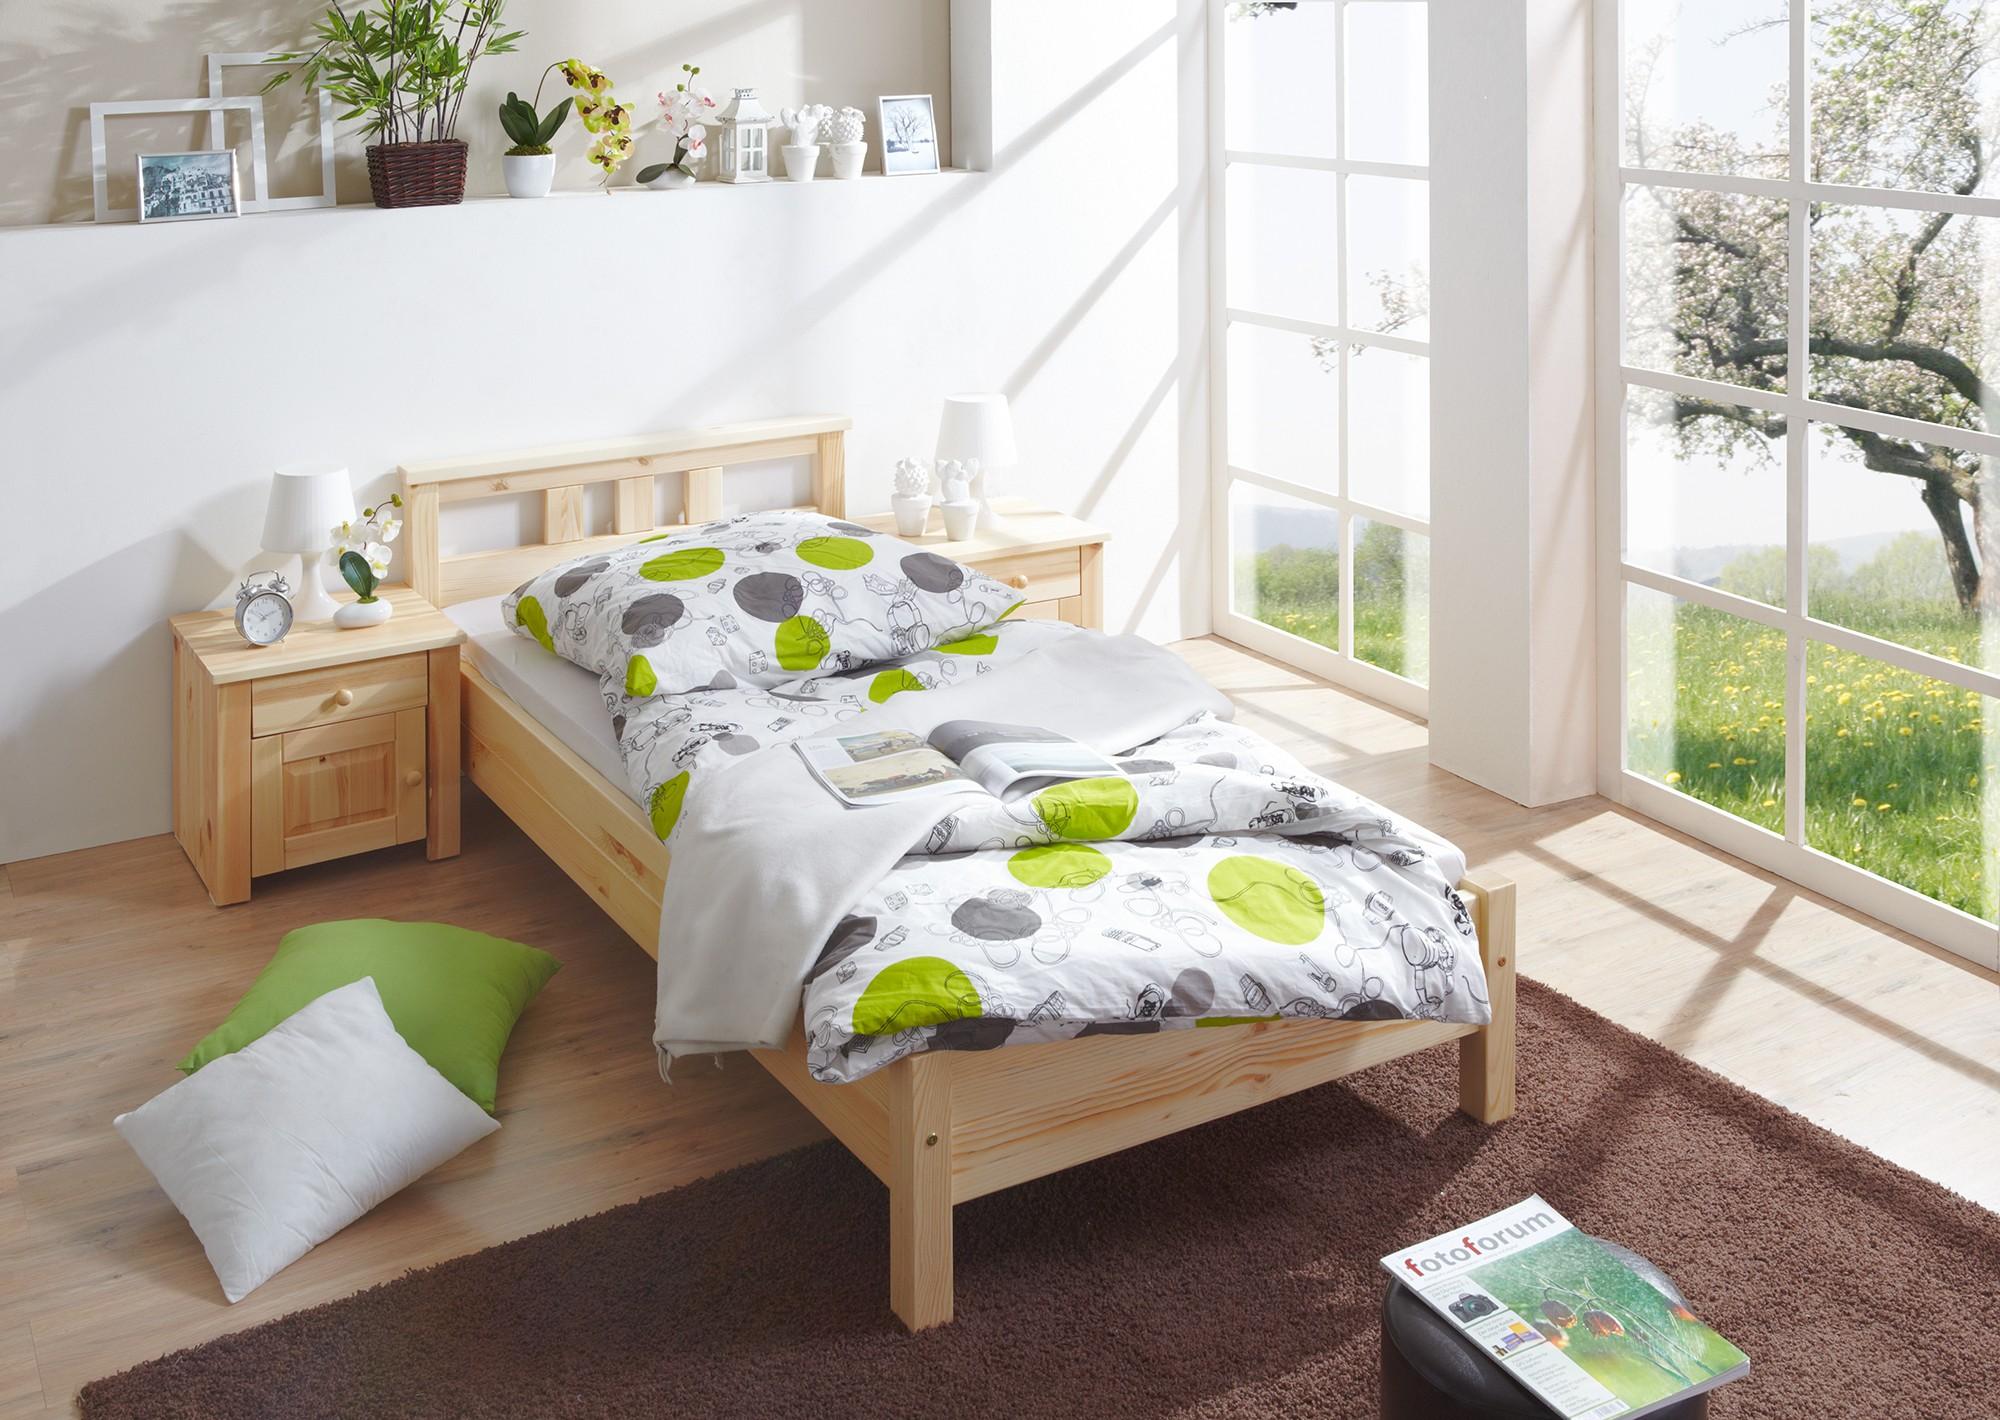 einzelbett 100x200 kiefer natur h c m bel. Black Bedroom Furniture Sets. Home Design Ideas